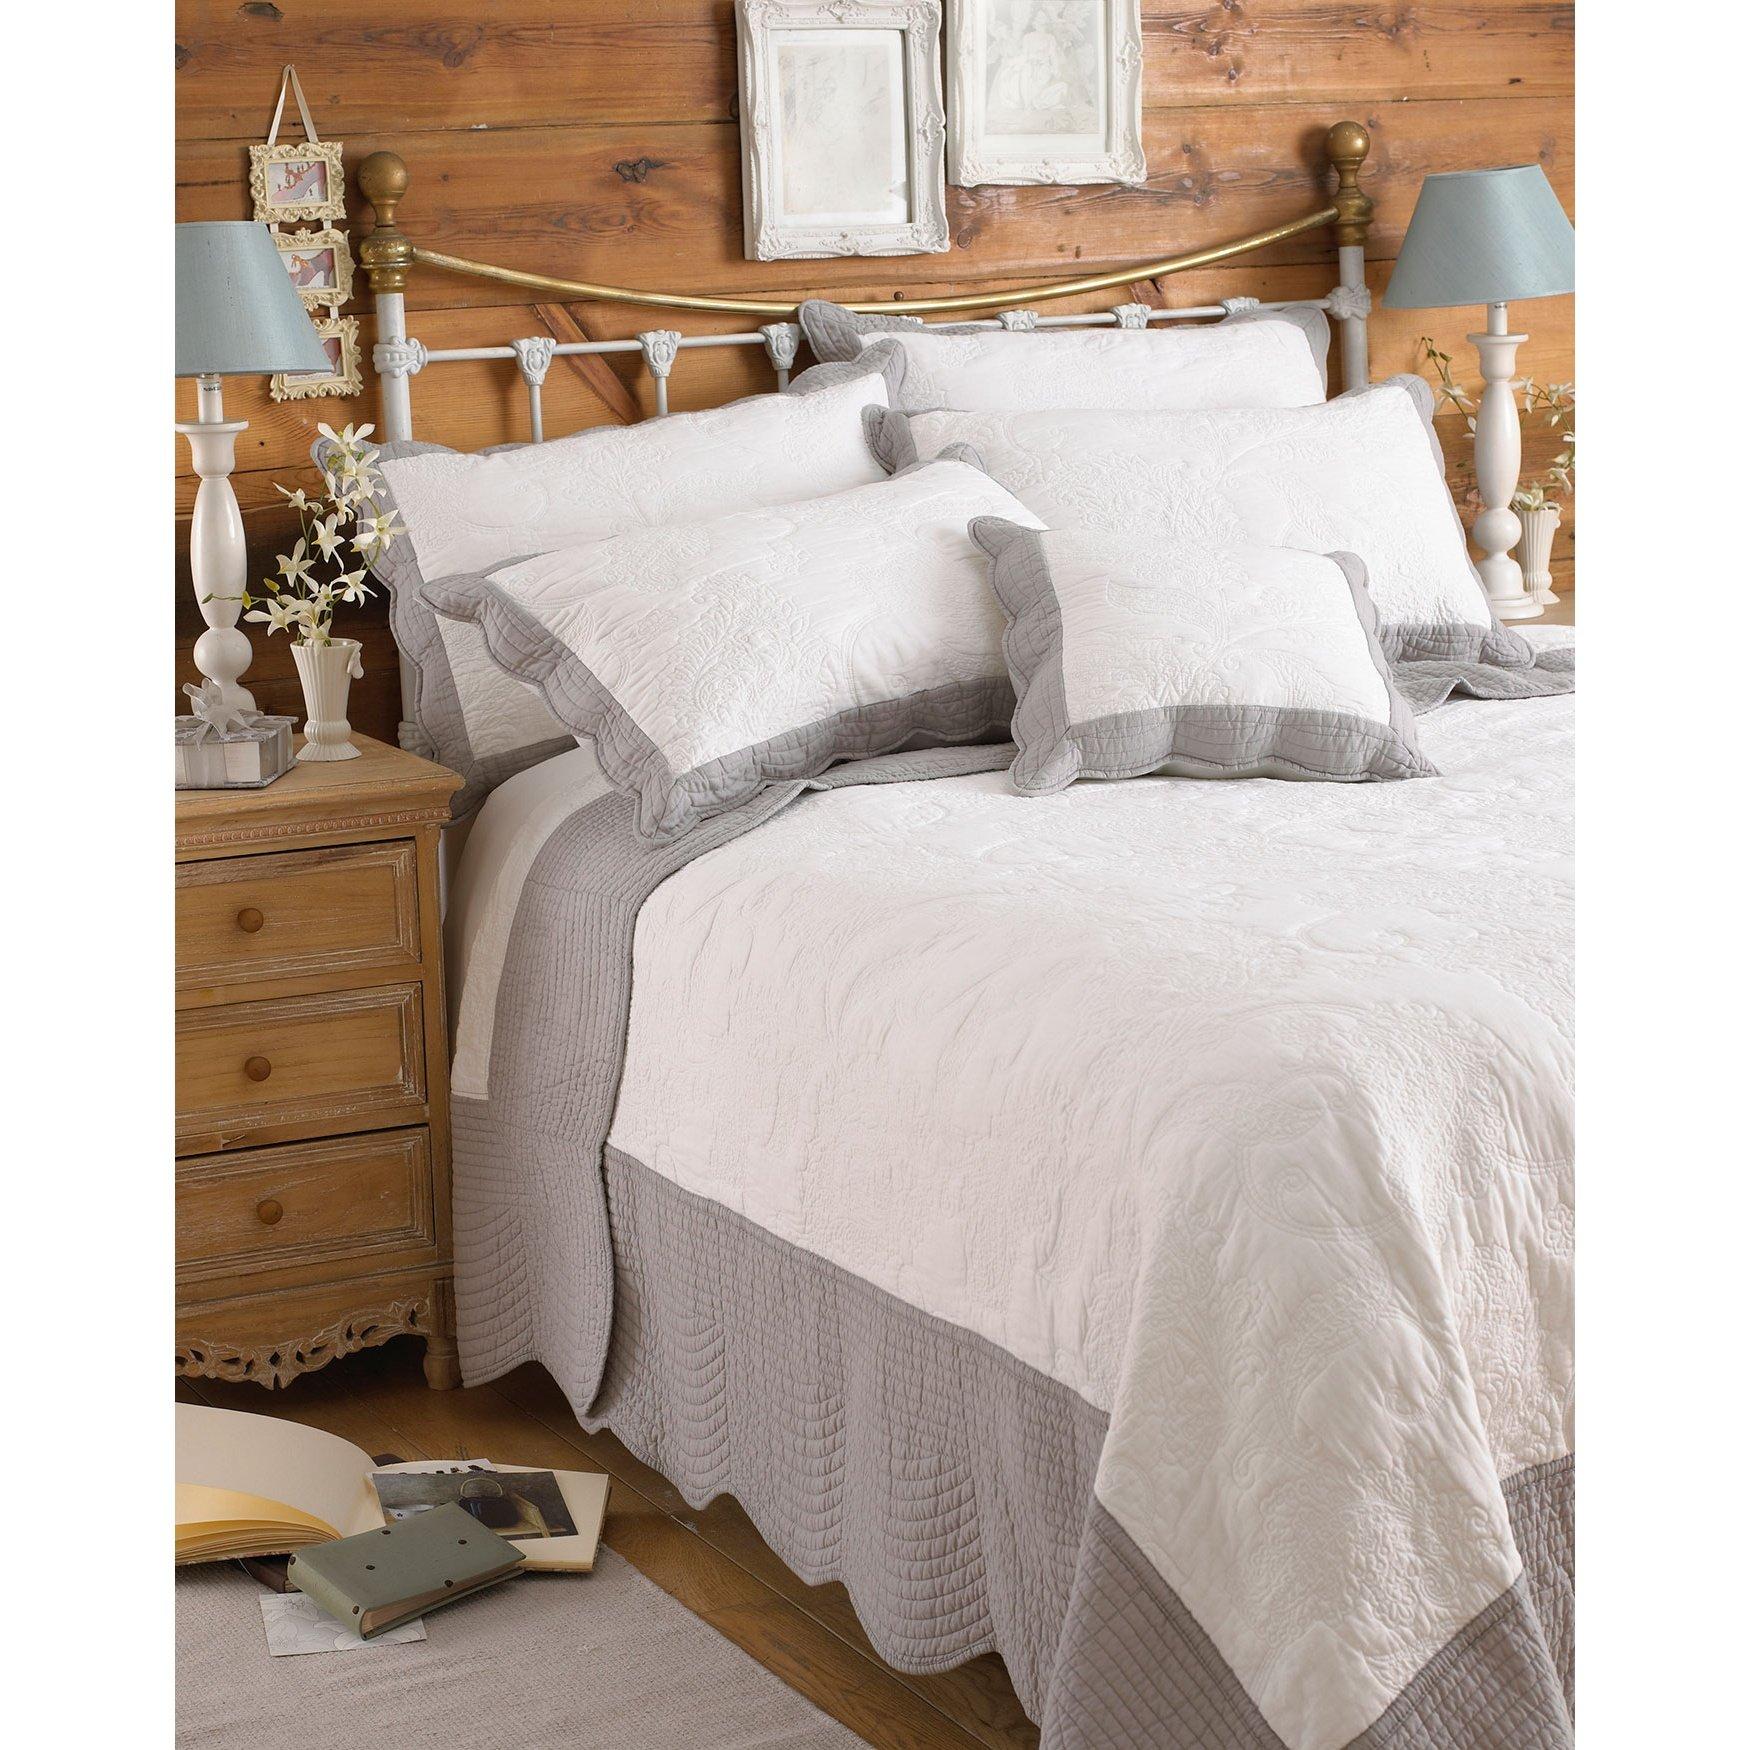 Riva Home Fayence Bedspread (94 x 102 inch) (White/Grey)